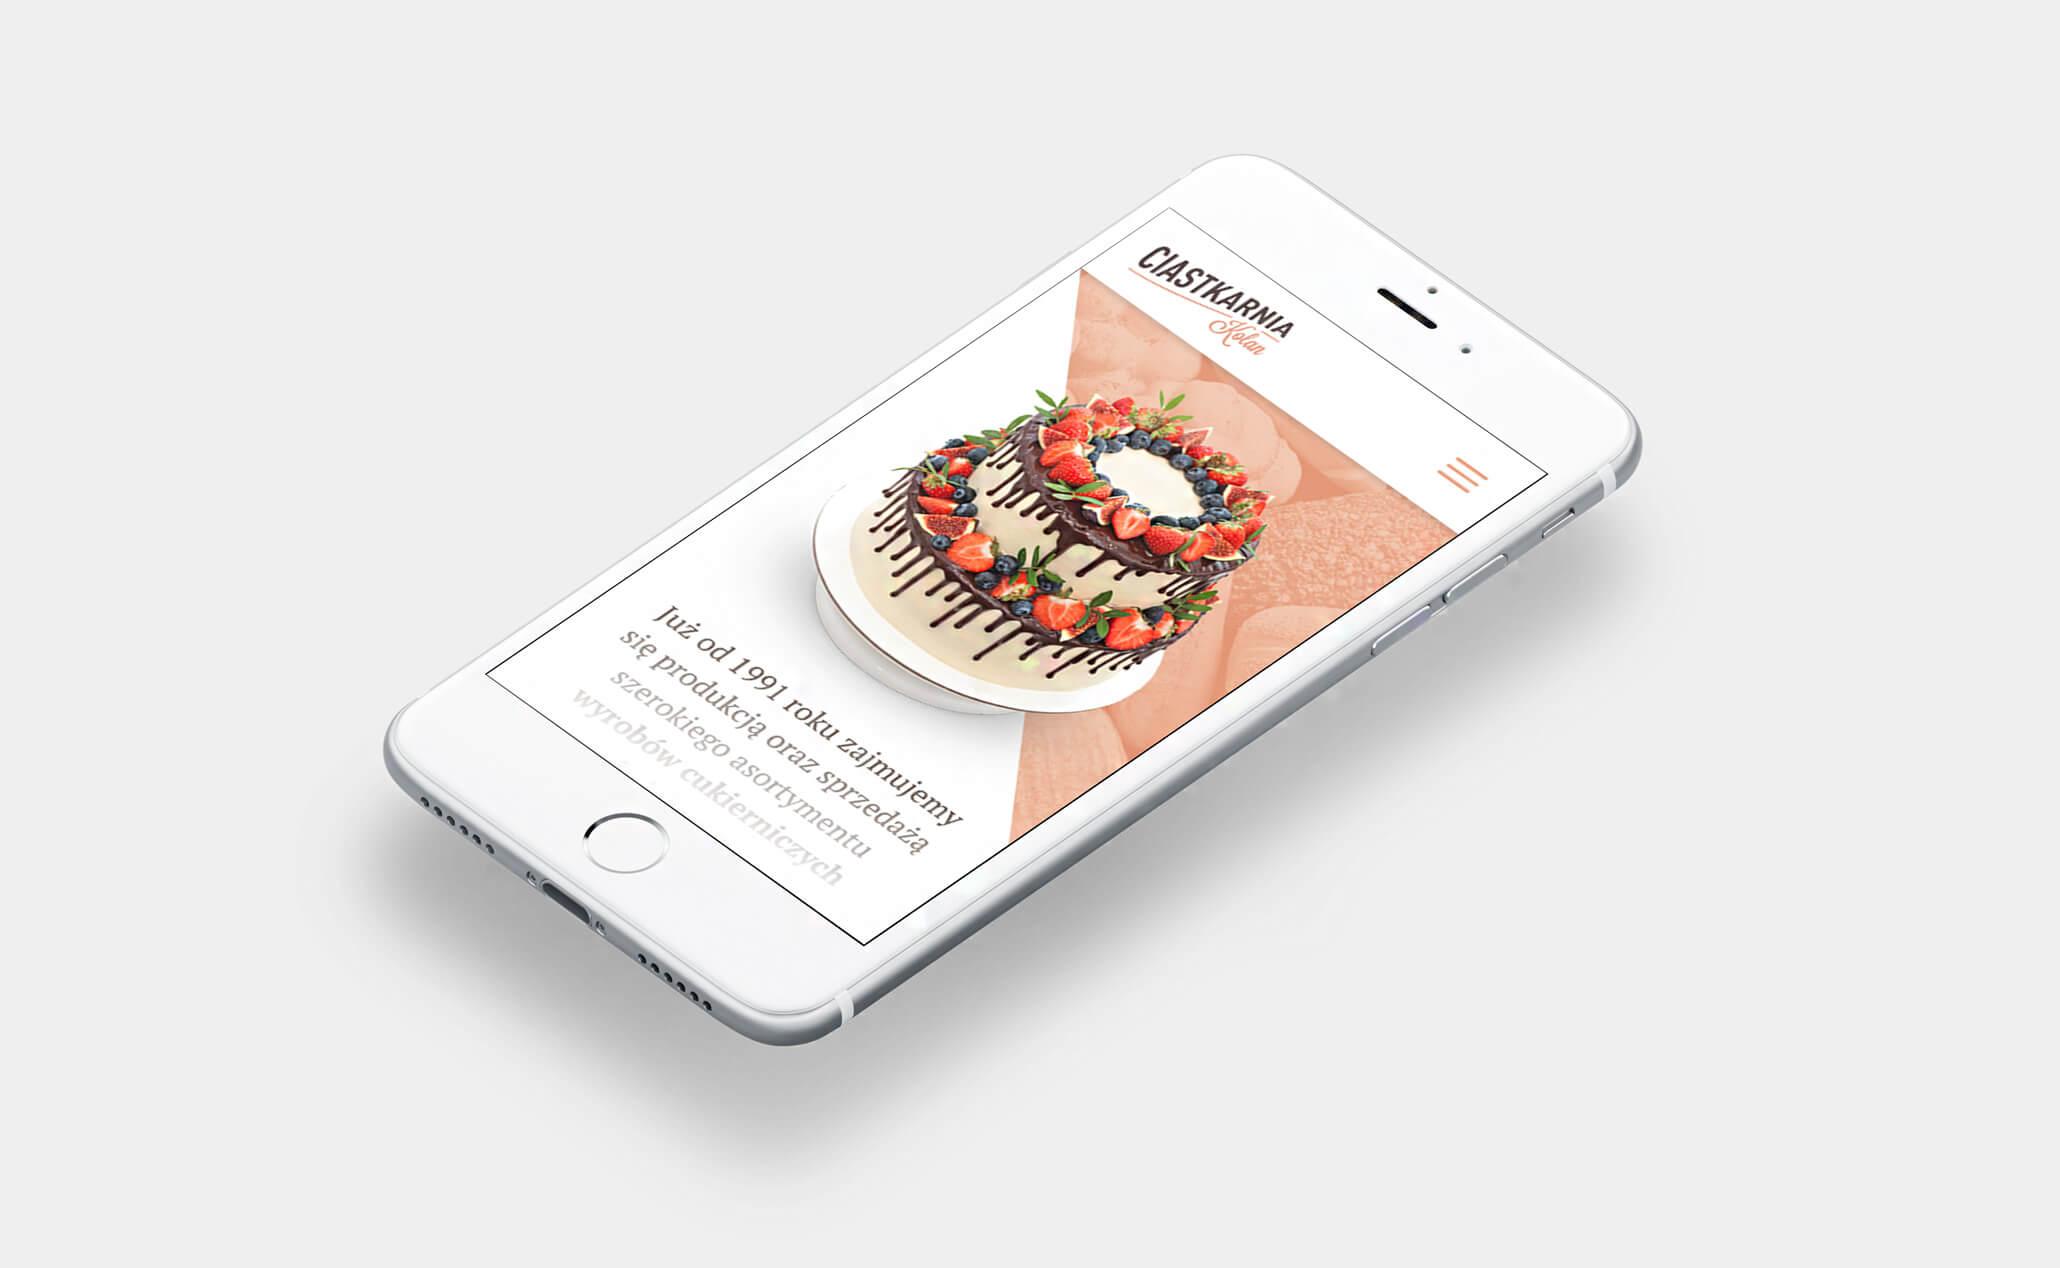 Ciastkarnia Kolan website (iPhone)